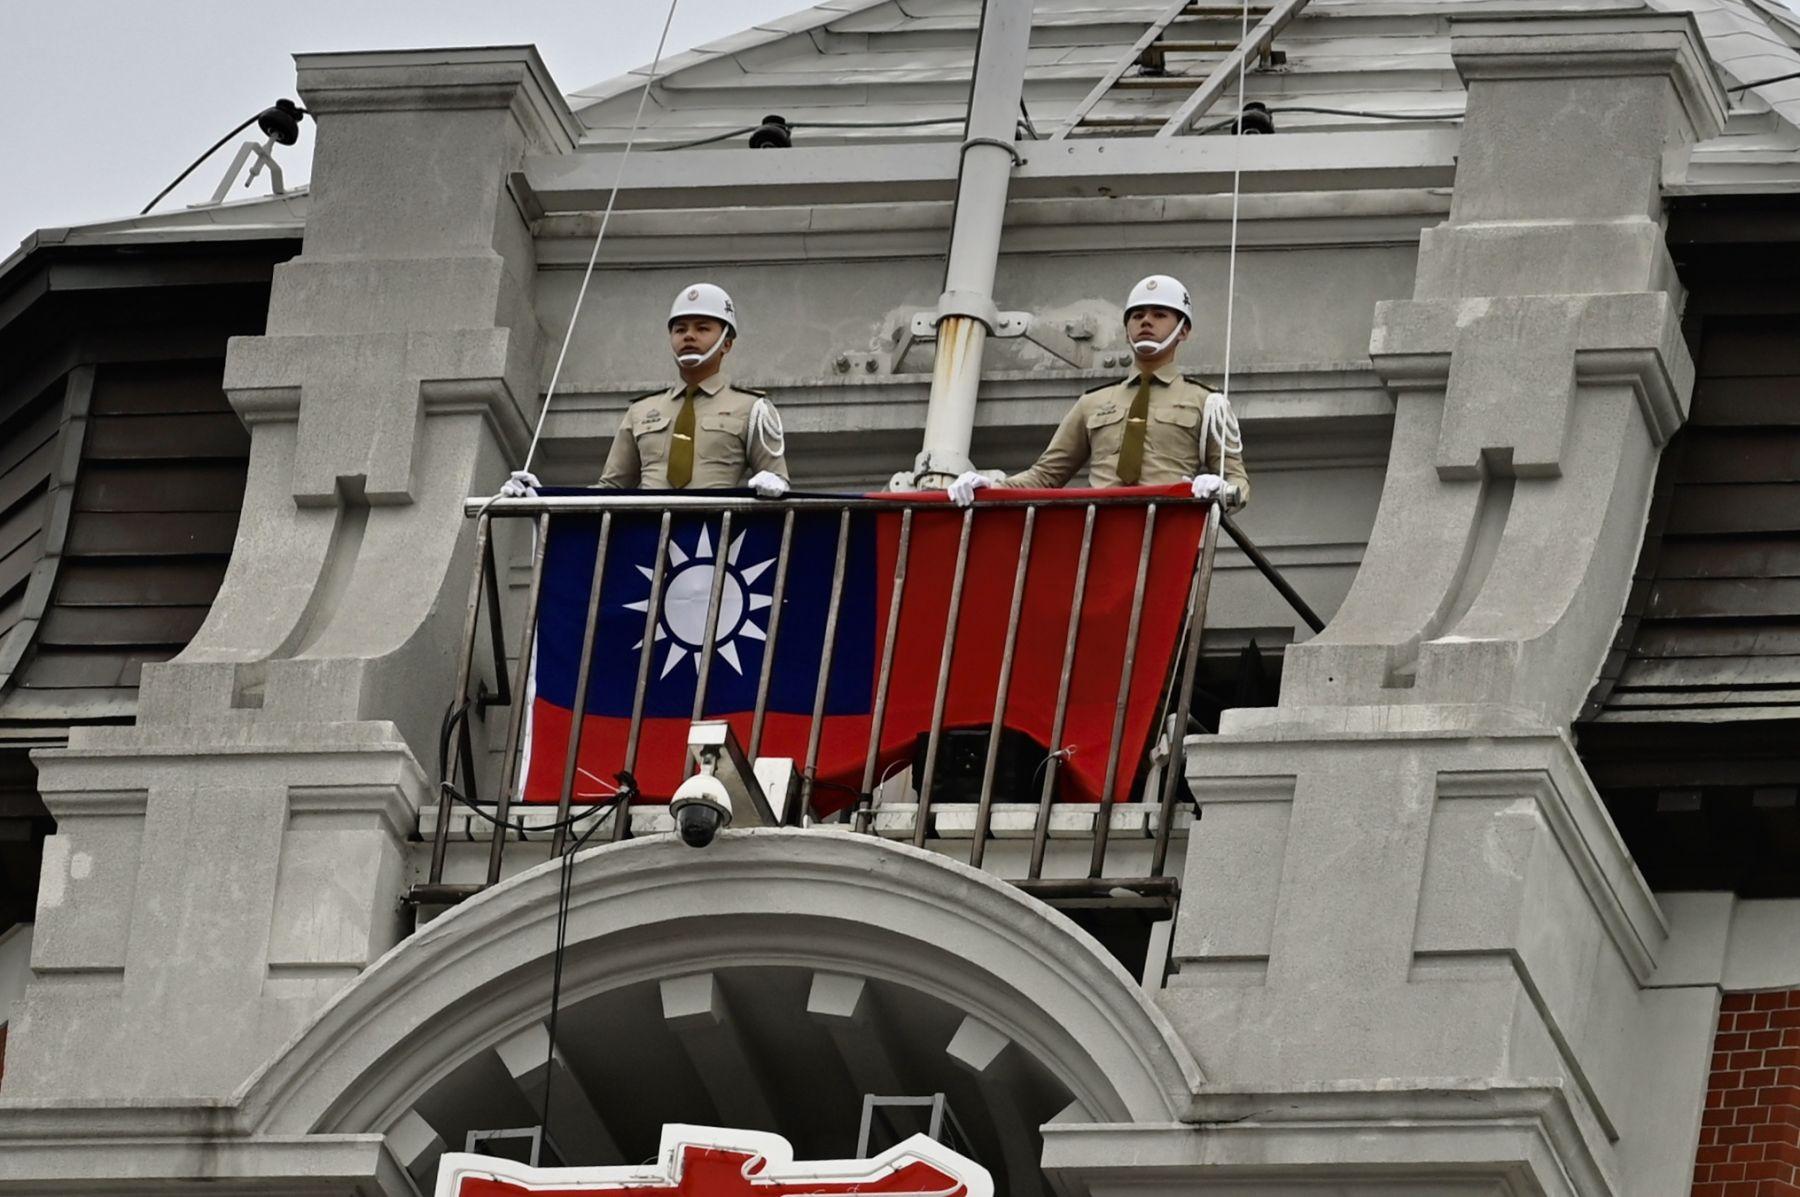 AFP/Sam Yeh